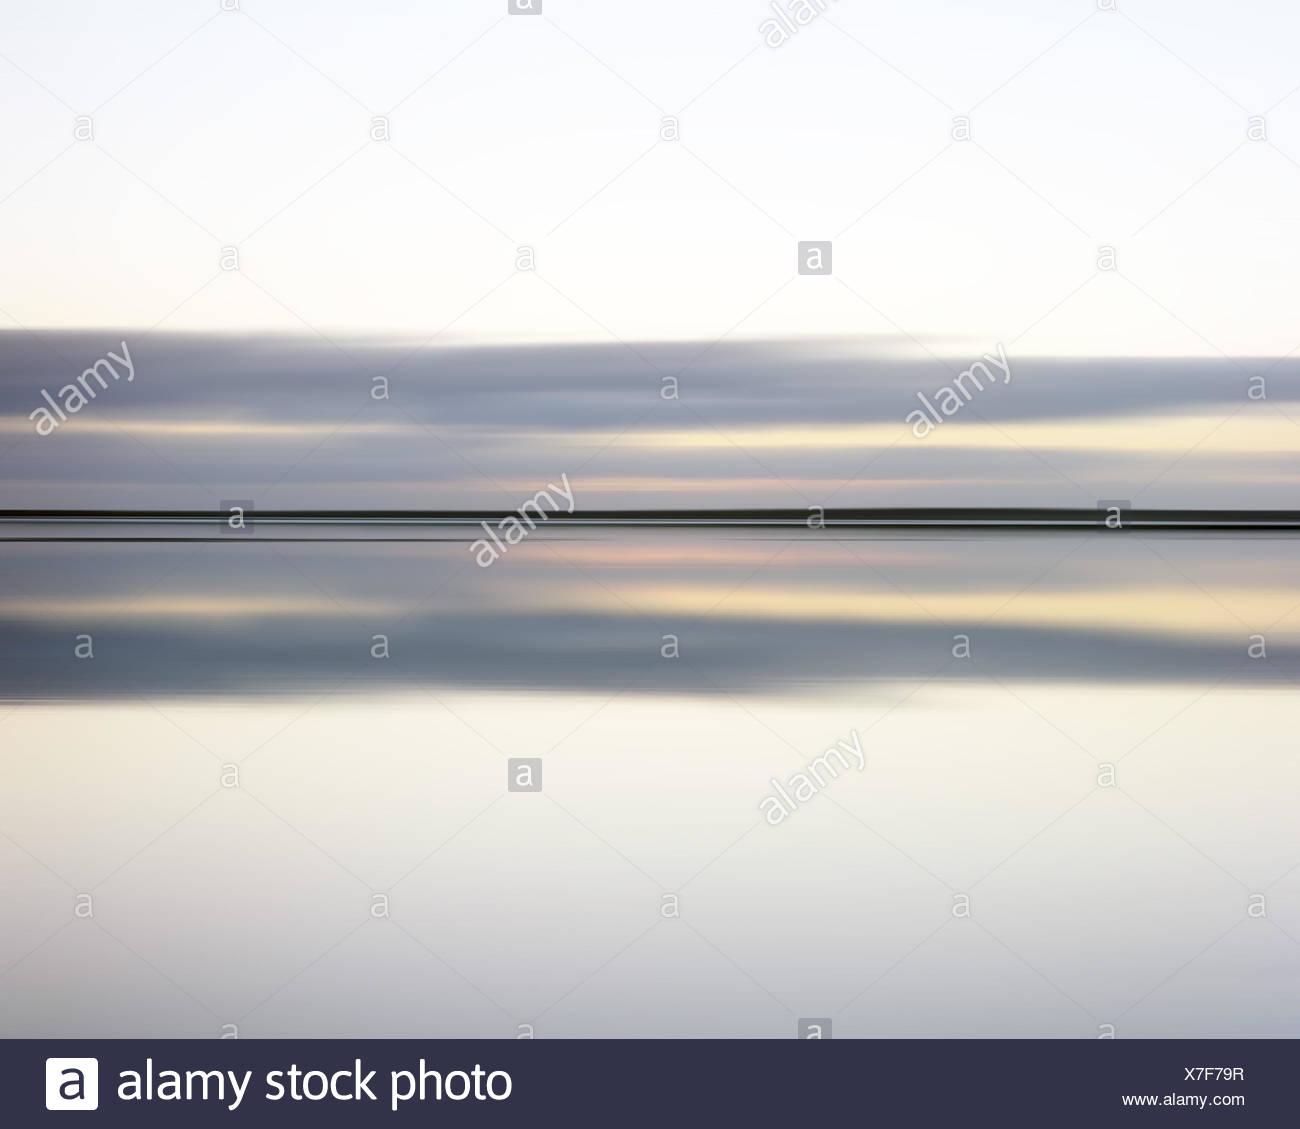 Die Nordsee, windstillen, Himmel, Wolken, Horizont, Stockbild